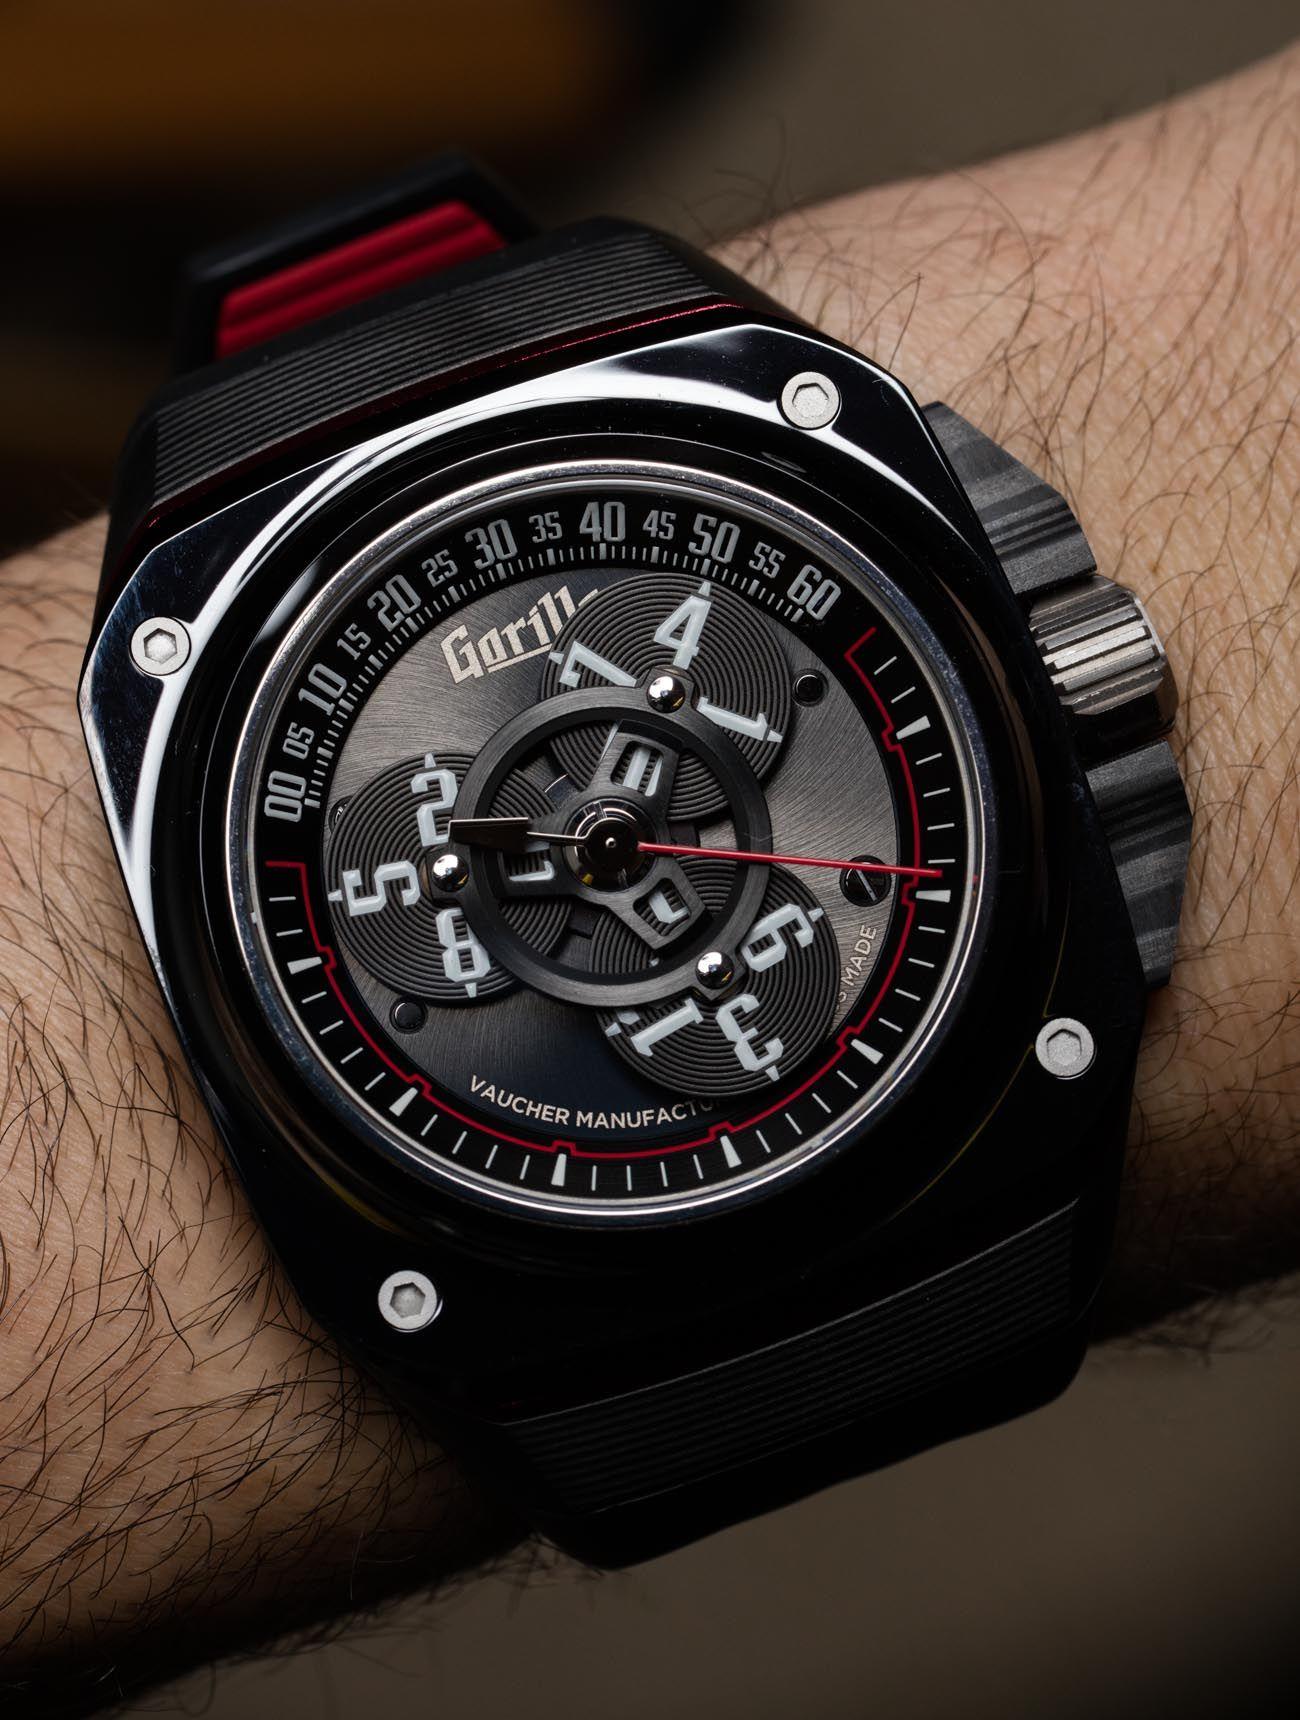 zapatos de separación 6166f 9d647 Gorilla Fastback GT Drift Watch | Watches in 2019 | Luxury ...